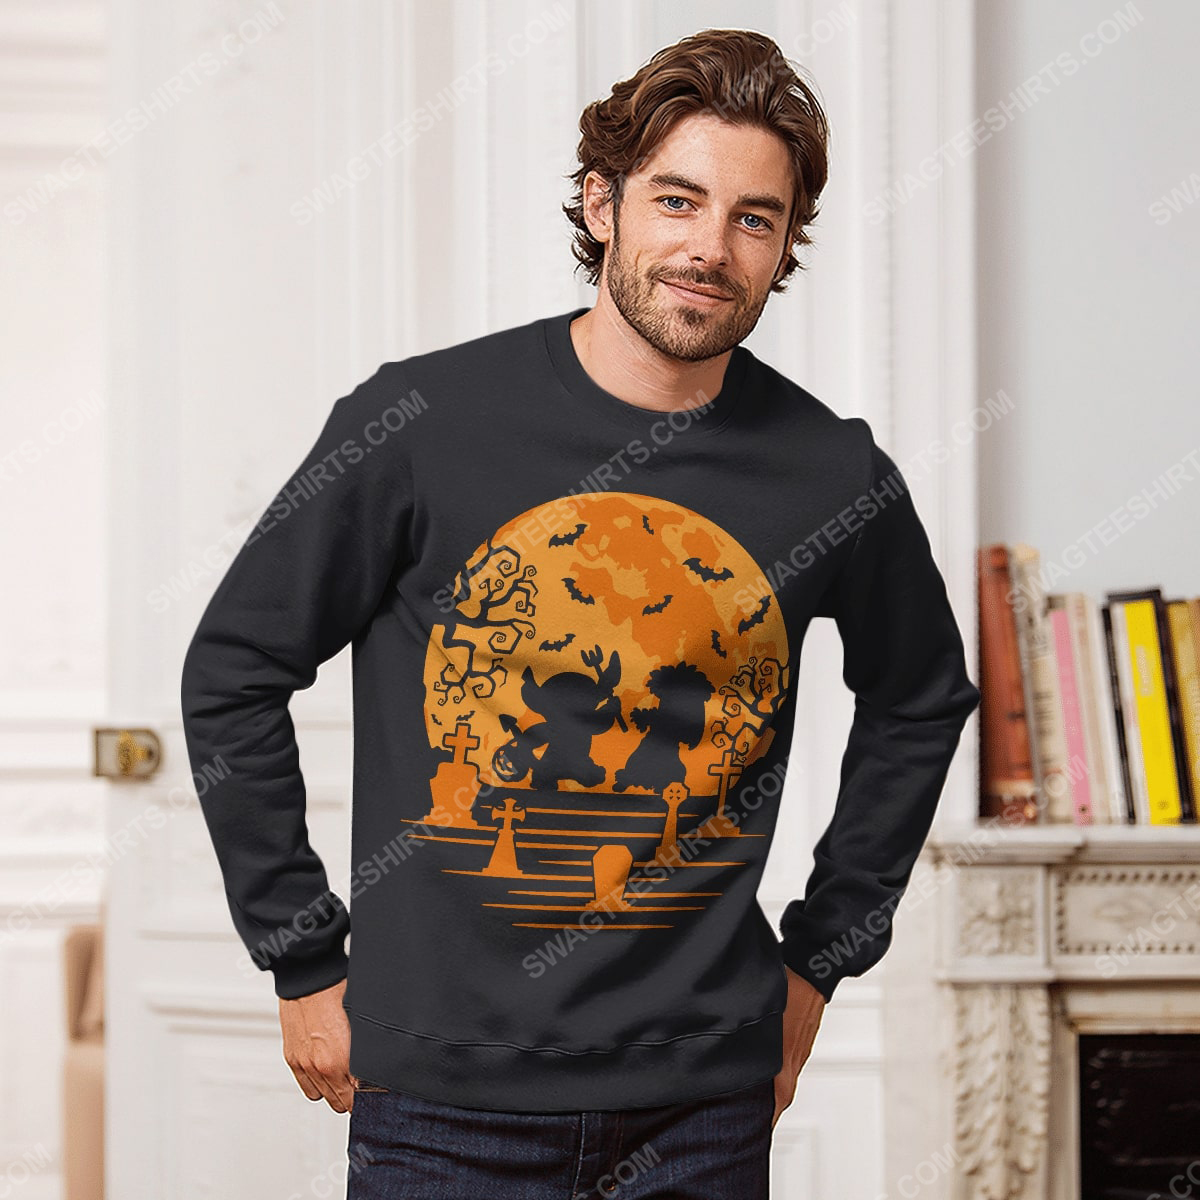 Lilo and stitch in halloween night sweatshirt 1(1)